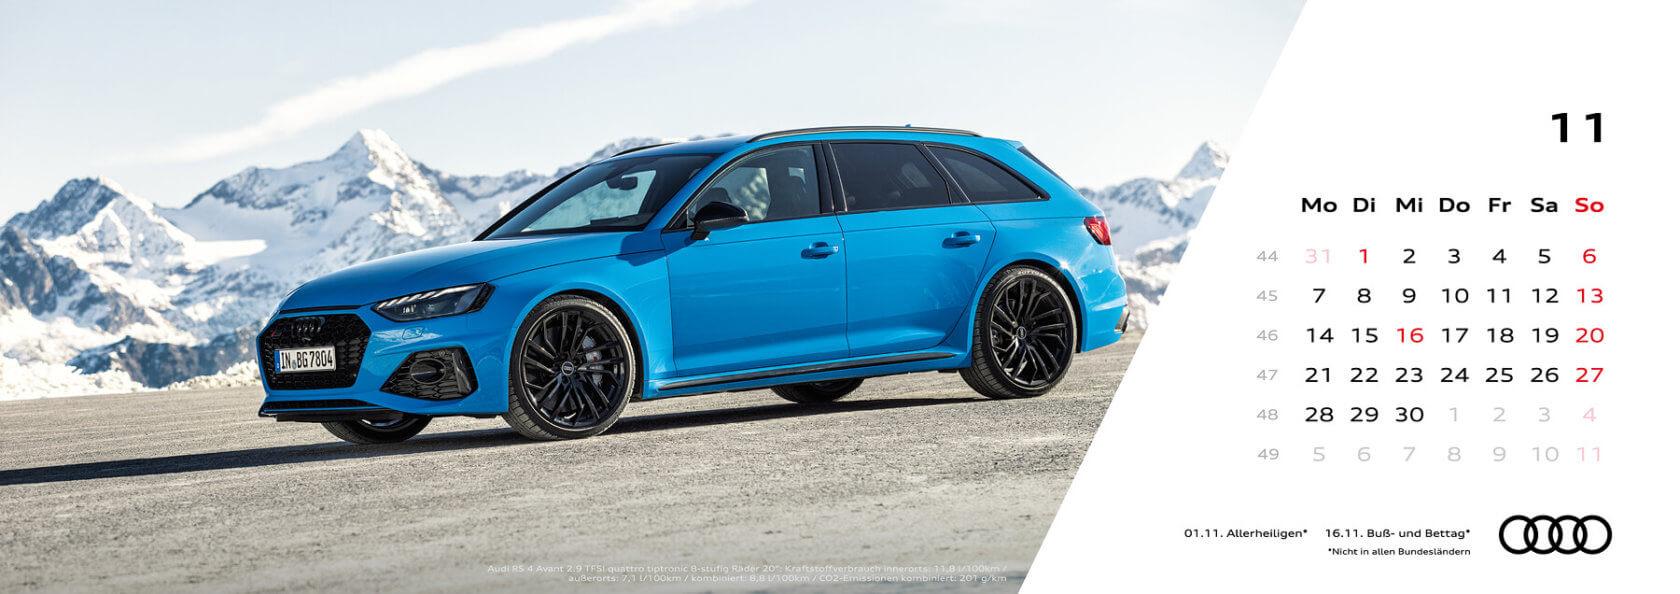 Audi Tischkalender 2022 - November